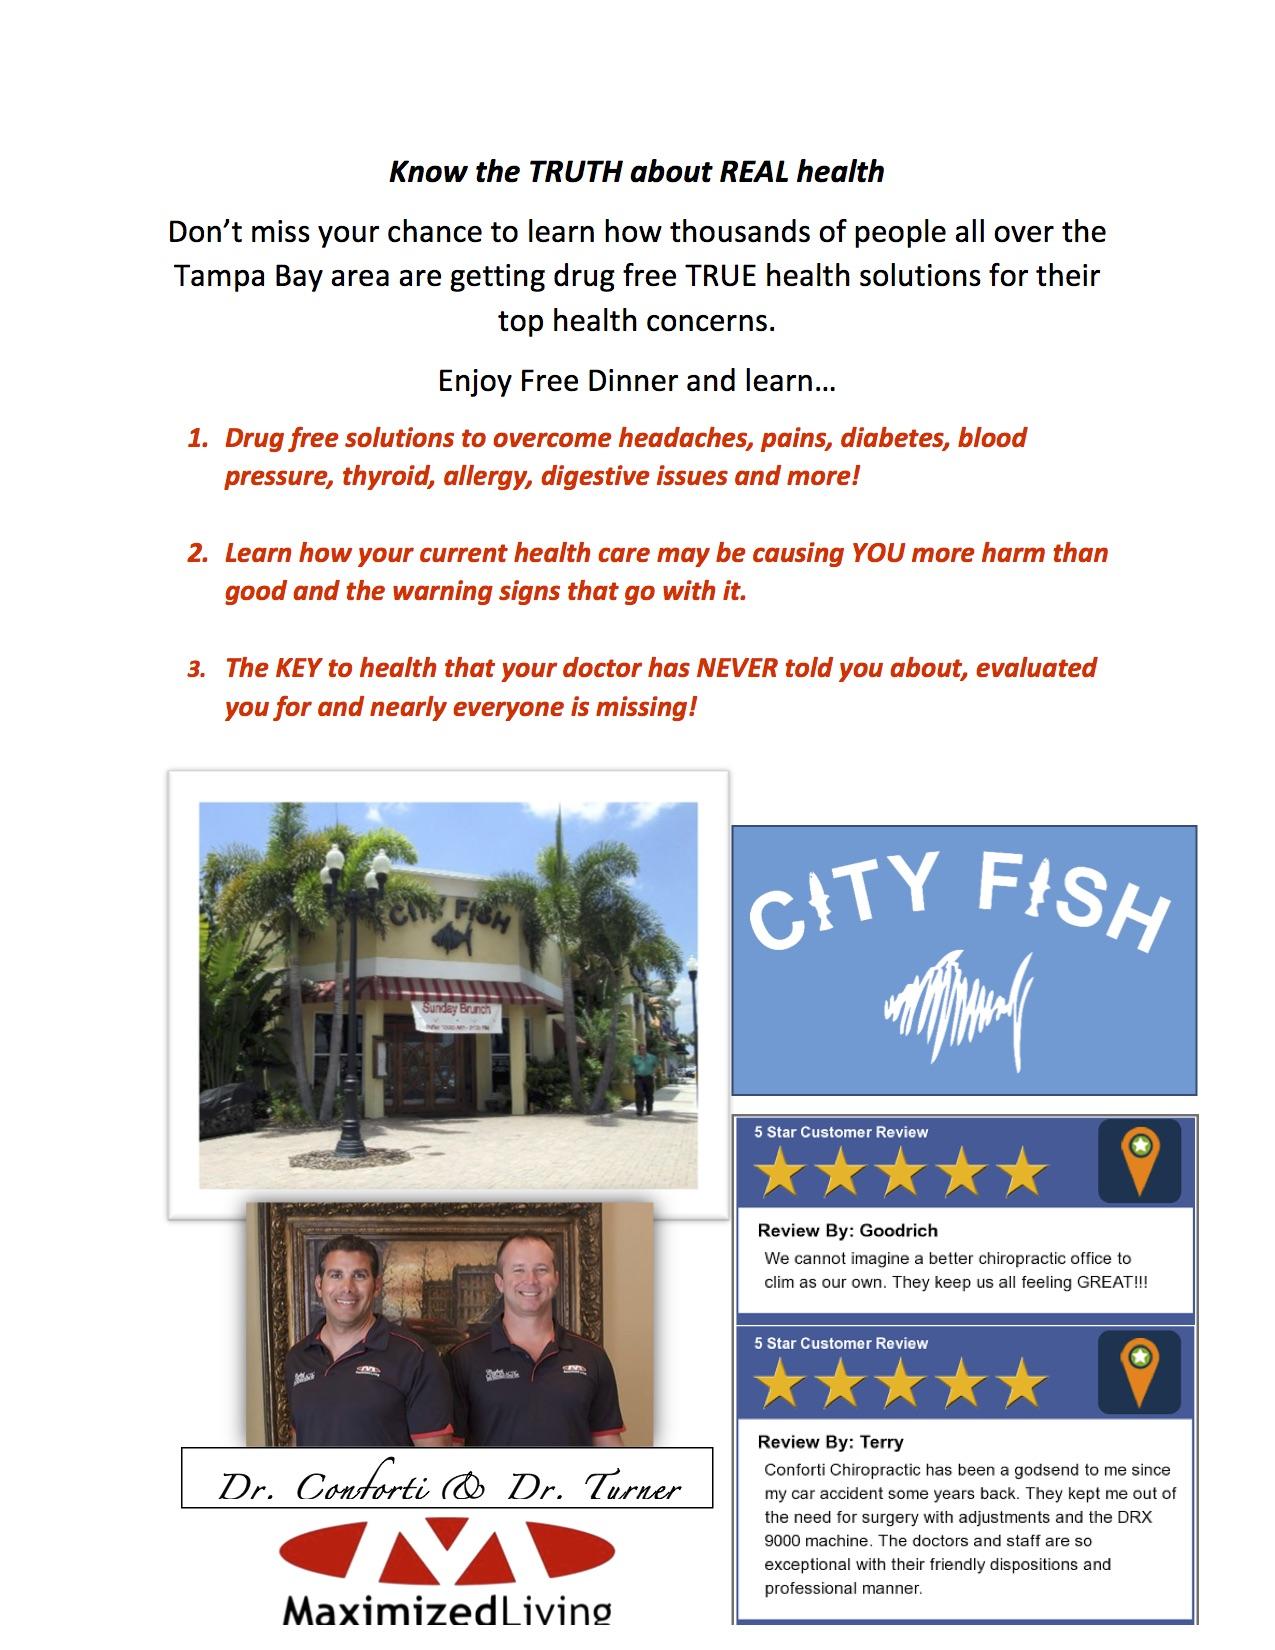 5 principles of natural healing dinner semminar dr for City fish oldsmar